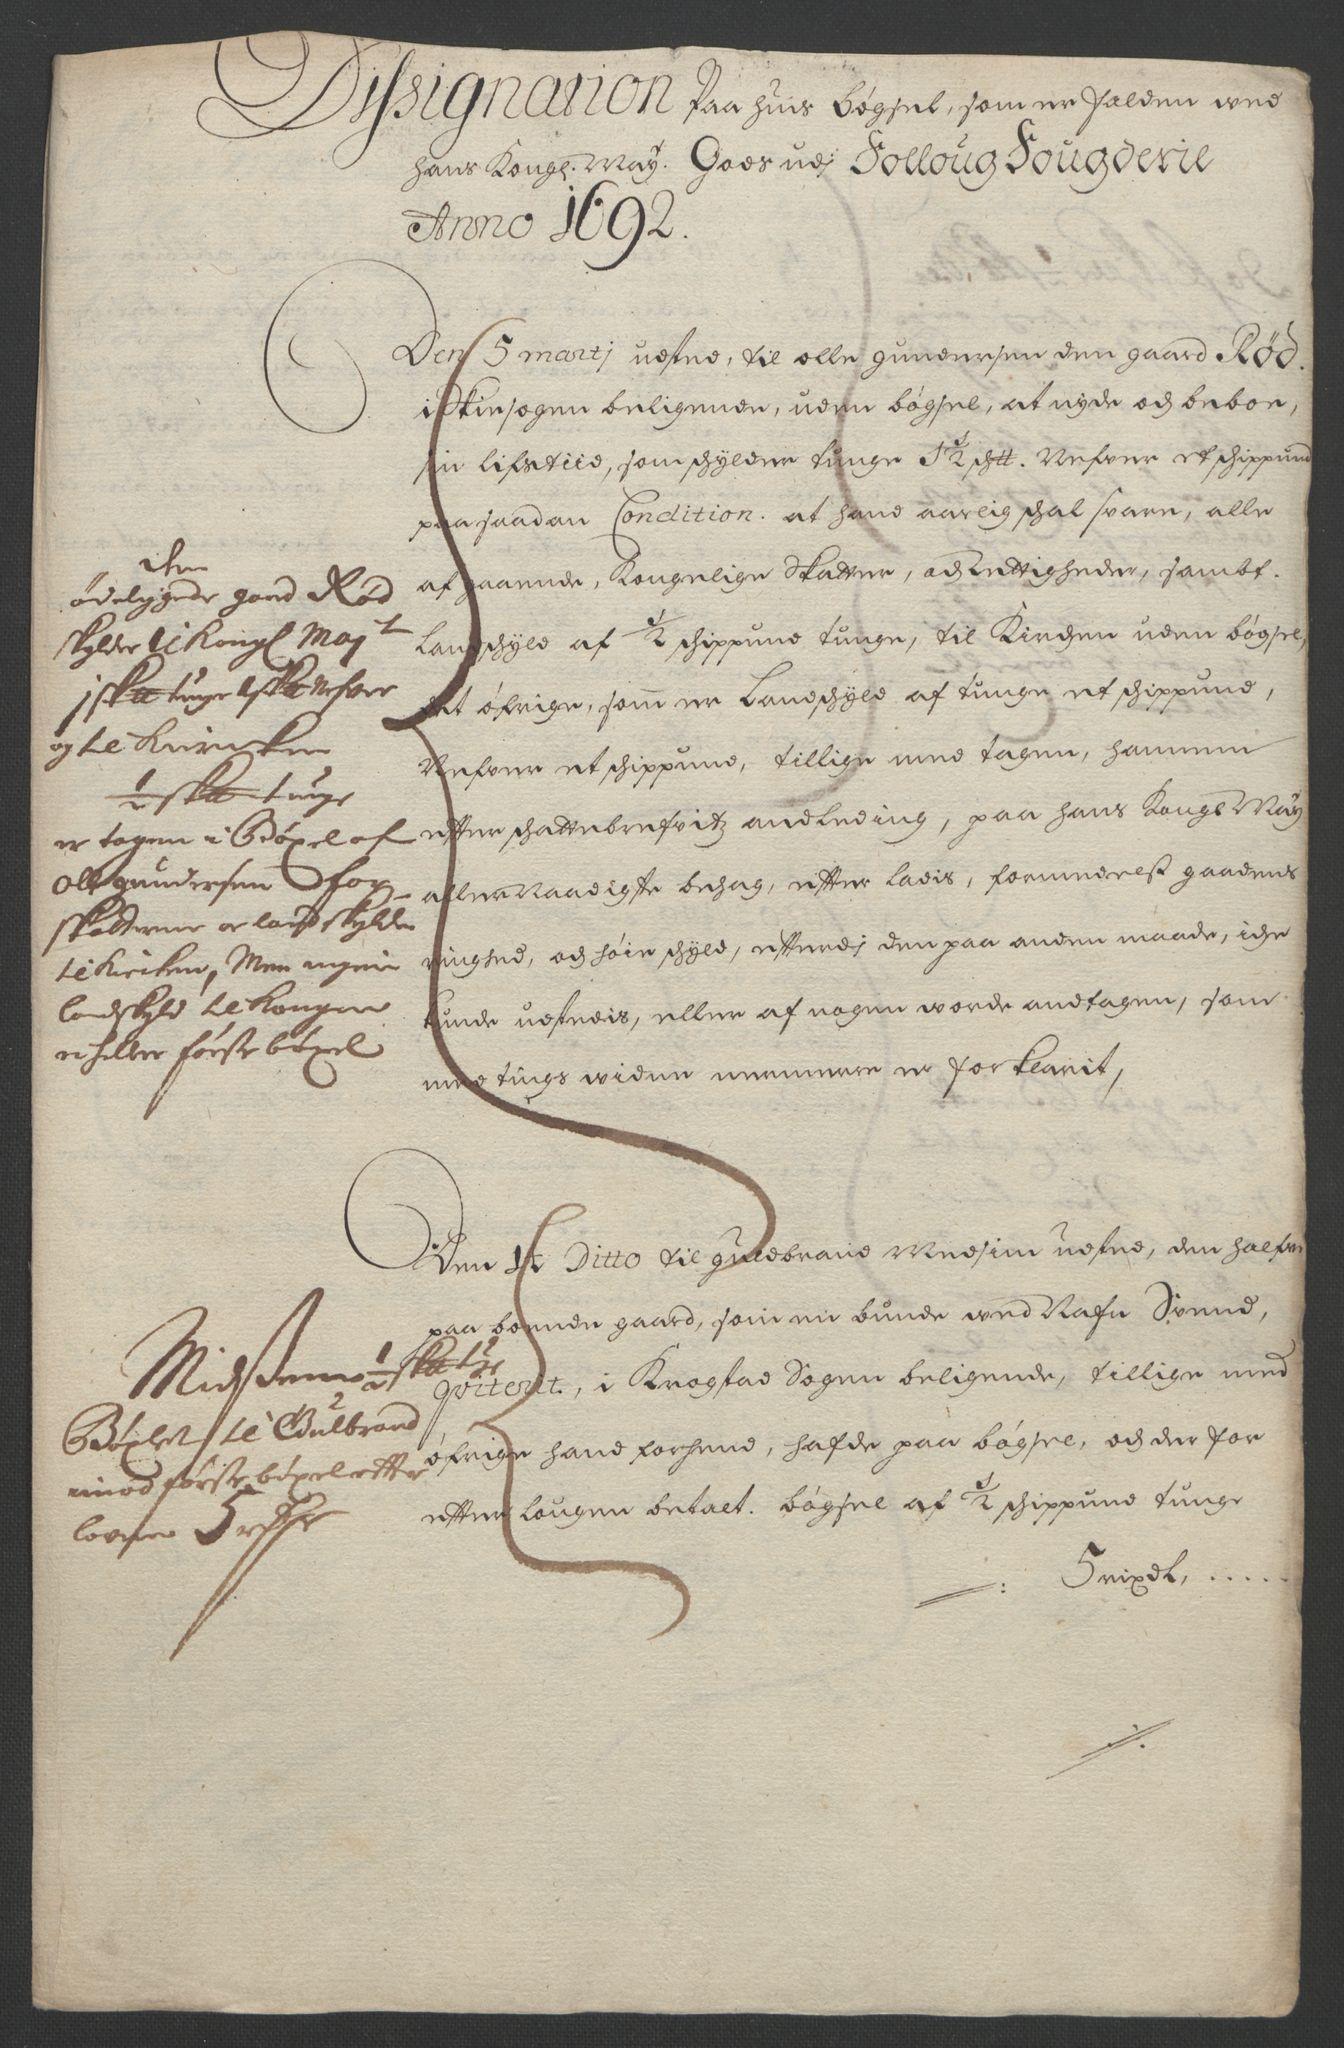 RA, Rentekammeret inntil 1814, Reviderte regnskaper, Fogderegnskap, R09/L0437: Fogderegnskap Follo, 1692-1693, s. 26